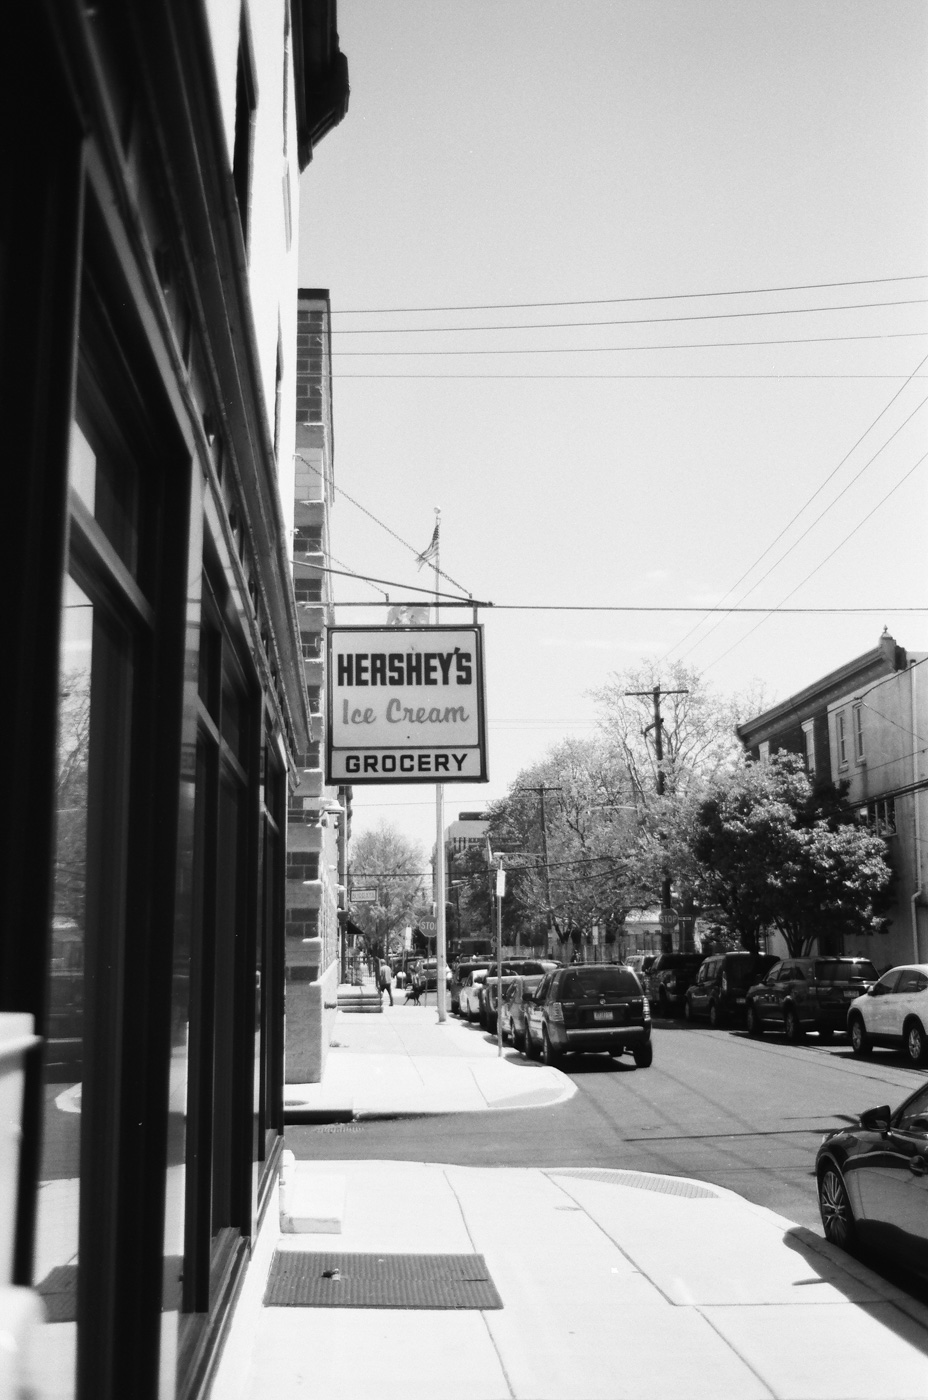 Hershey's Ice Cream Grocery